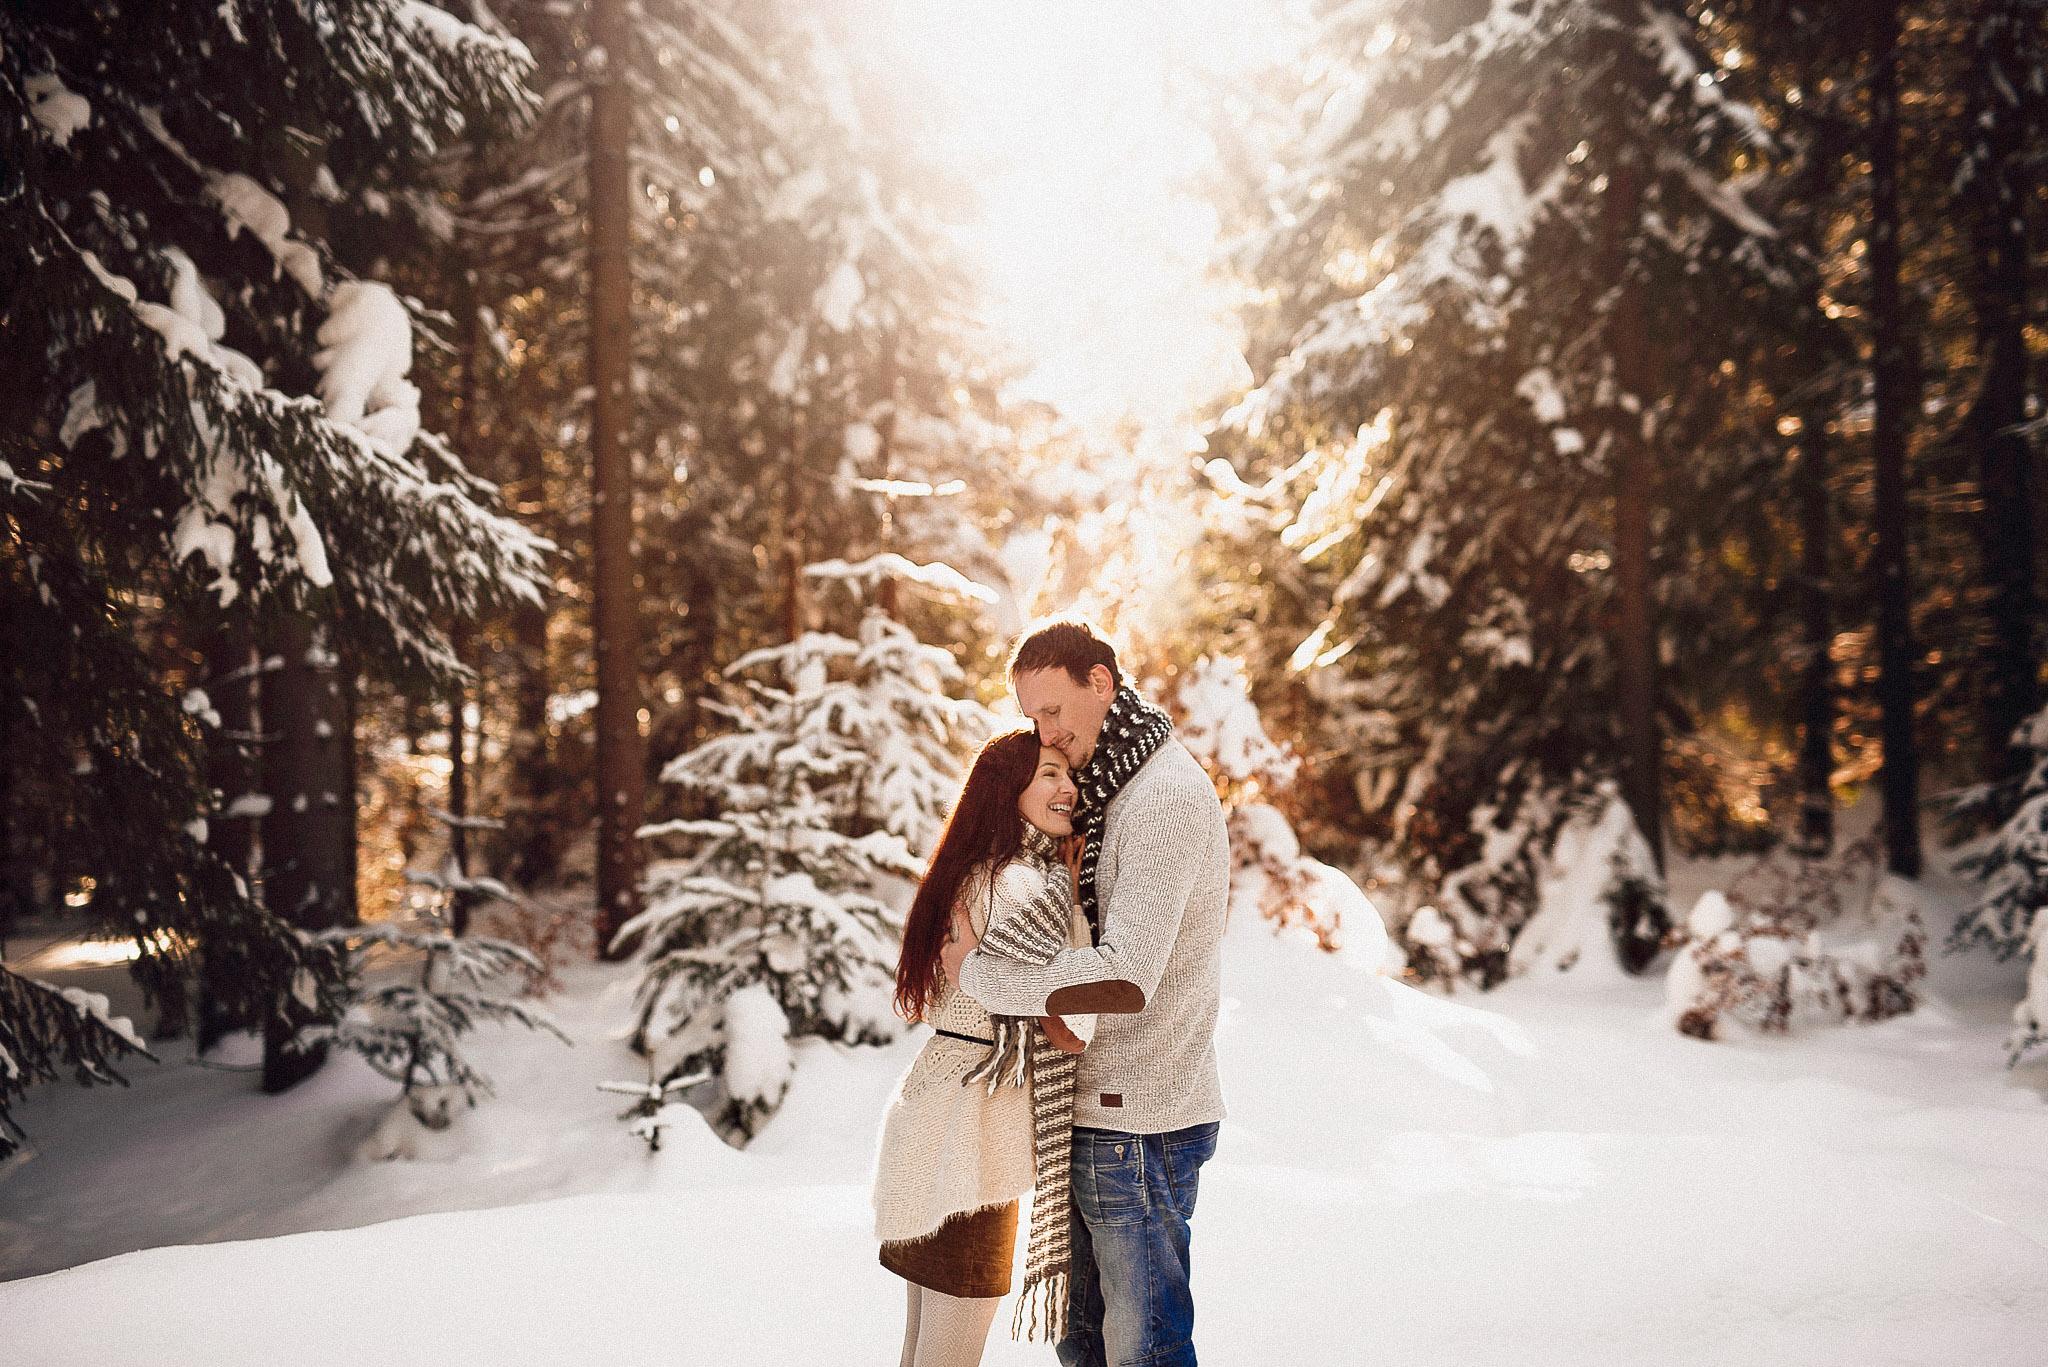 vintage, Orava, Oravská Lesná, zima, sneh, kalamita, rozprávka, láska, zamilovaný pár